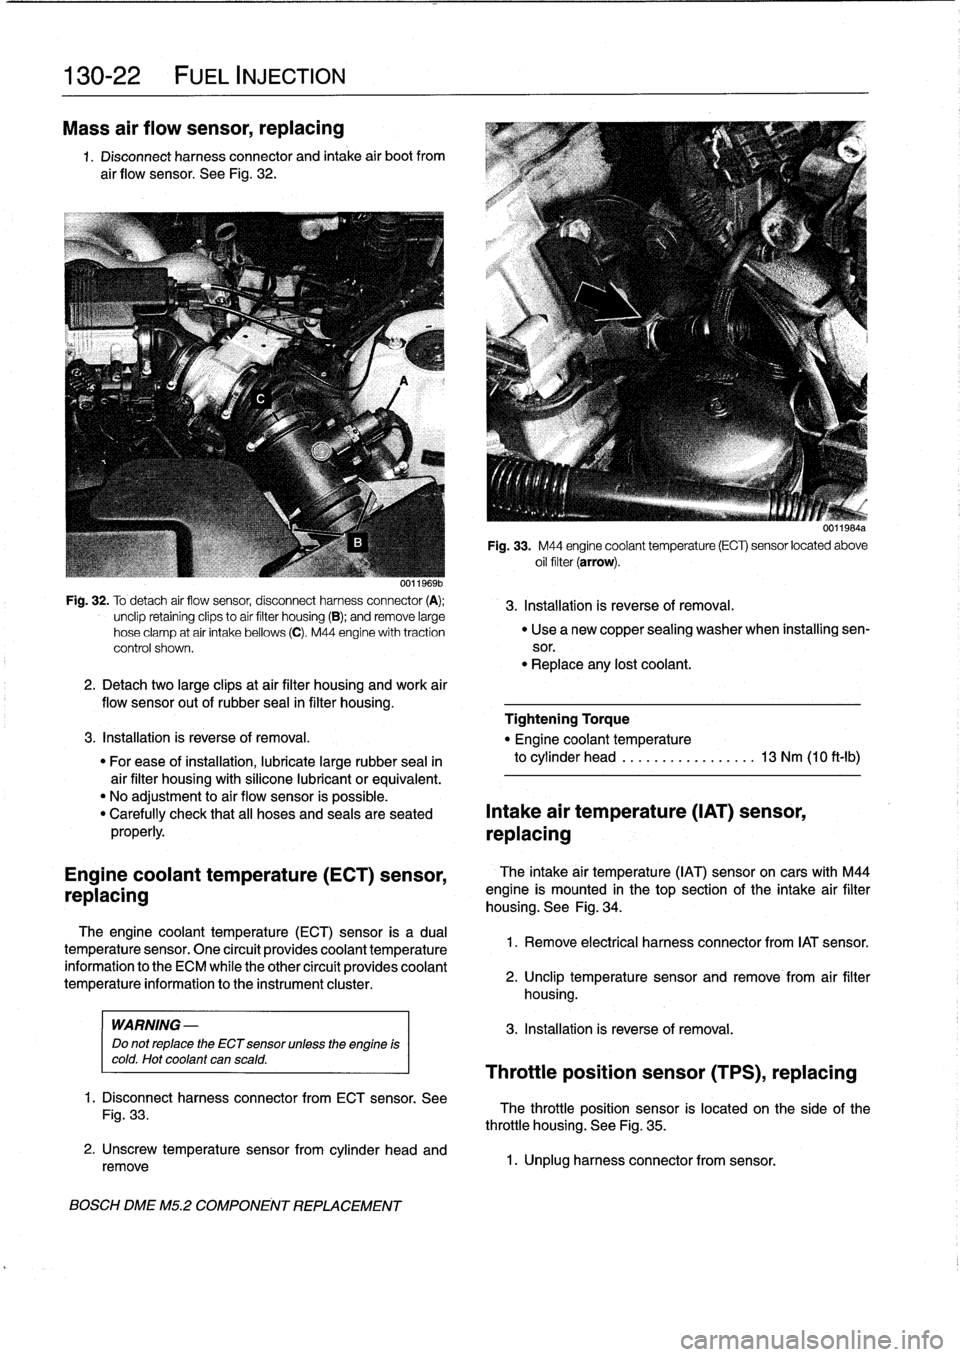 Oil Filter Bmw 325i 1994 E36 Workshop Manual Fig 2 Engine Coolant Temperature Ect Sensor Wiring Diagram